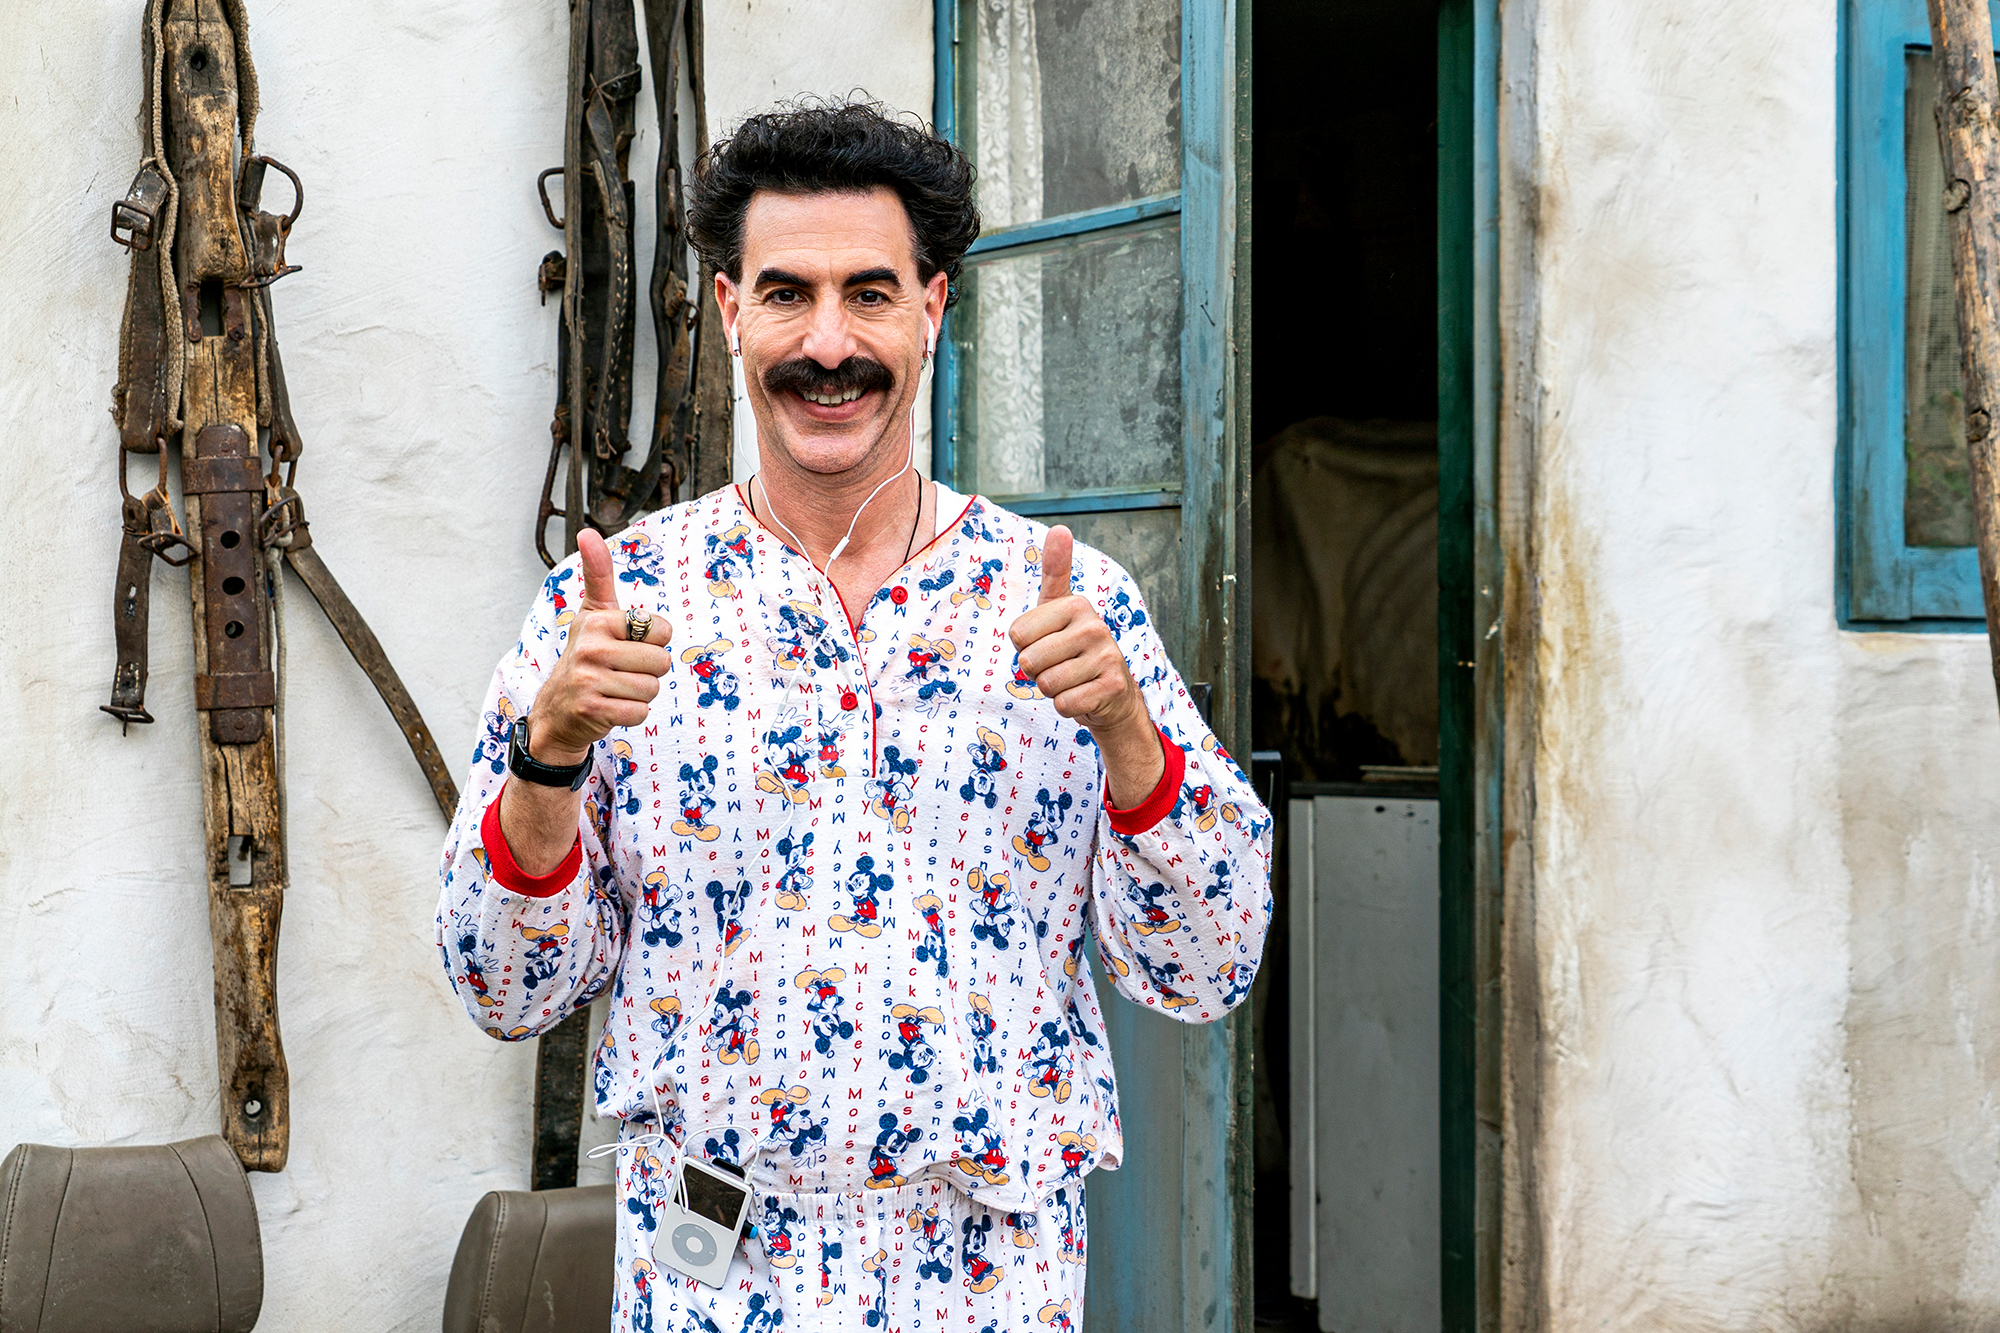 Kazakhstan adopts Borat's 'very nice' phrase in tourism push